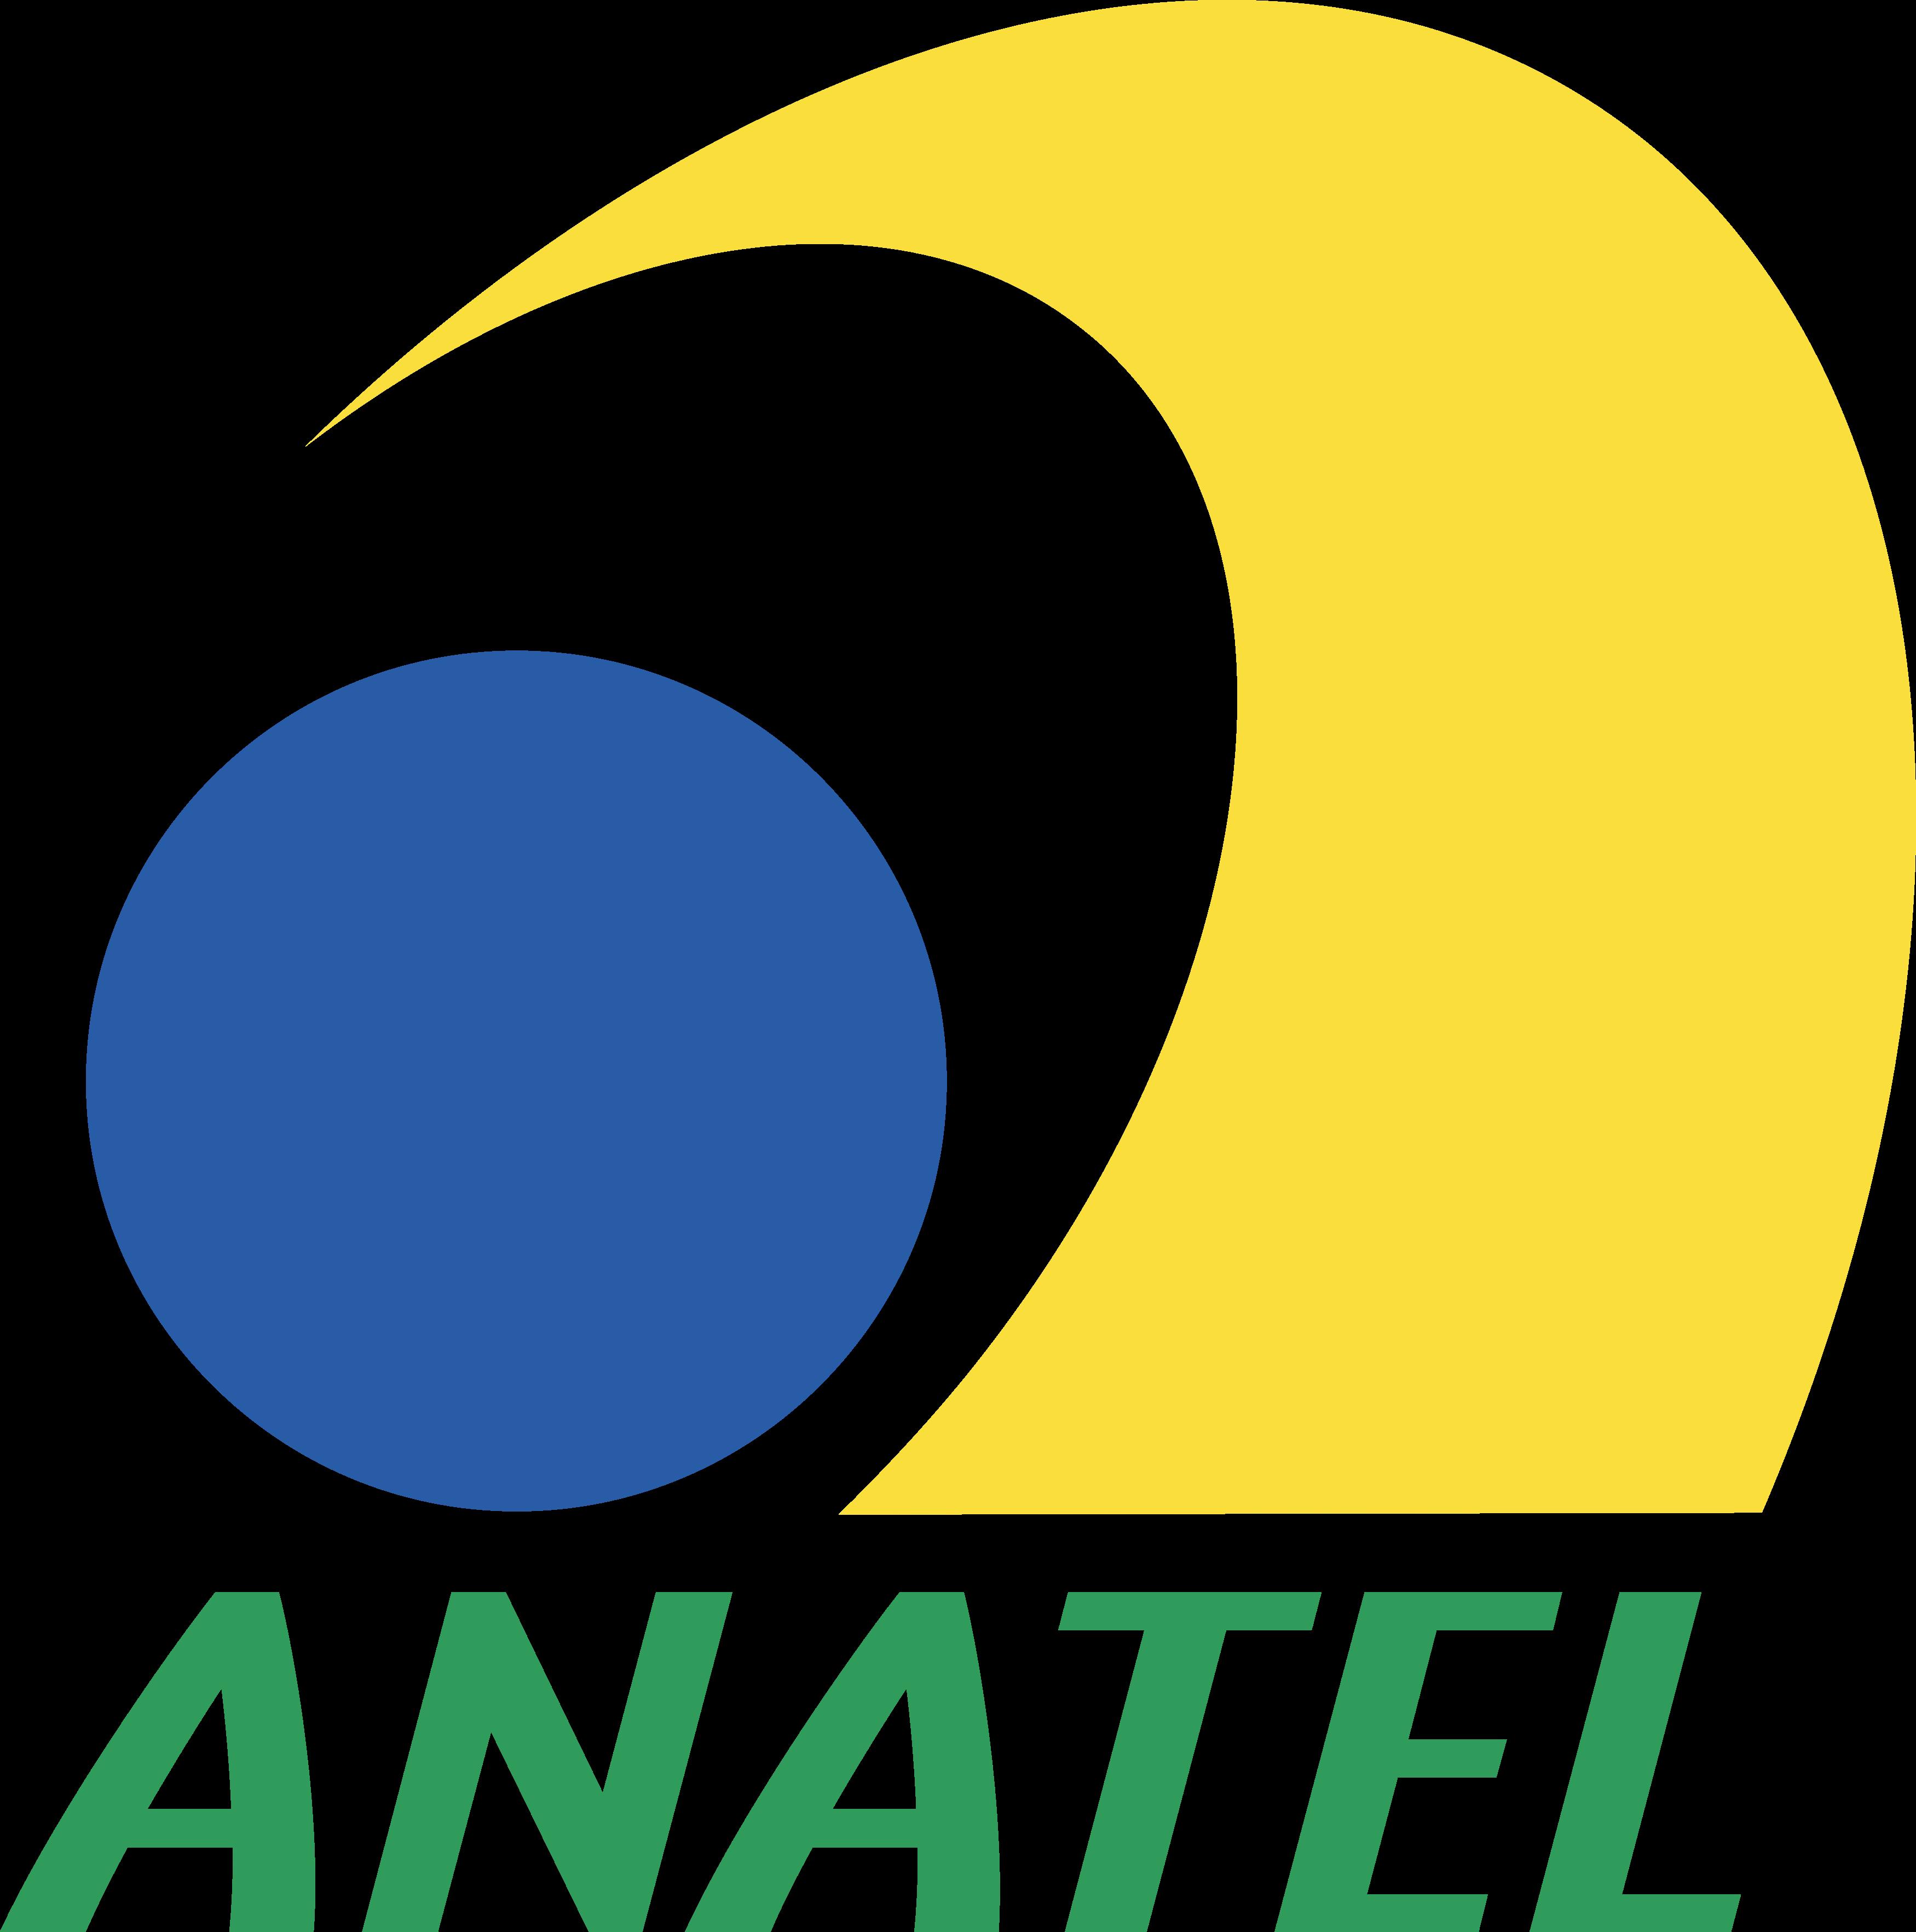 anatel-logo-1